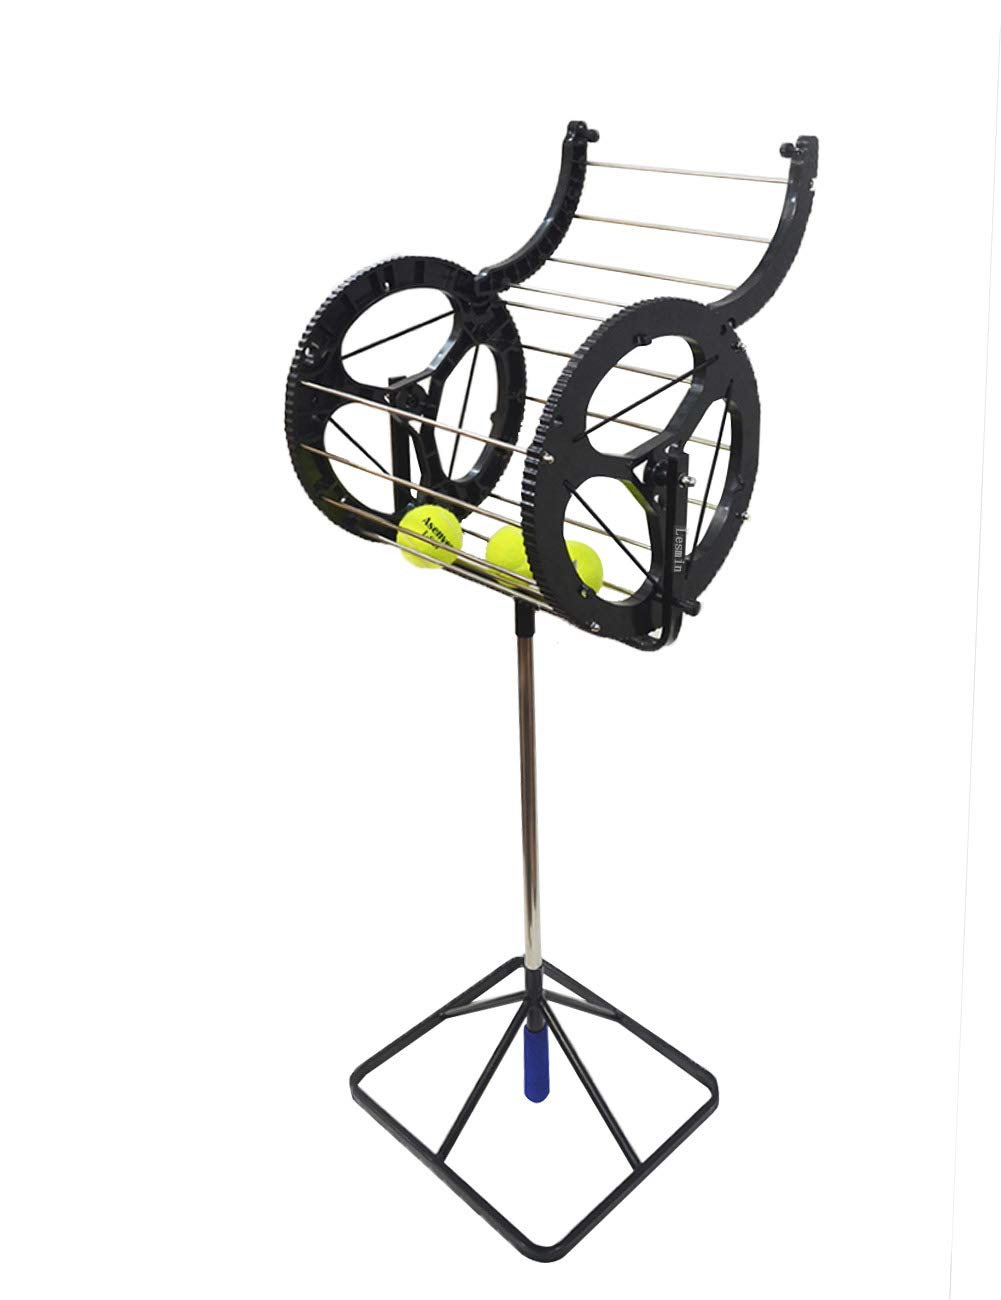 Amazon.com: Lesmin - Bolas de tenis 2 en 1 con asa para ...